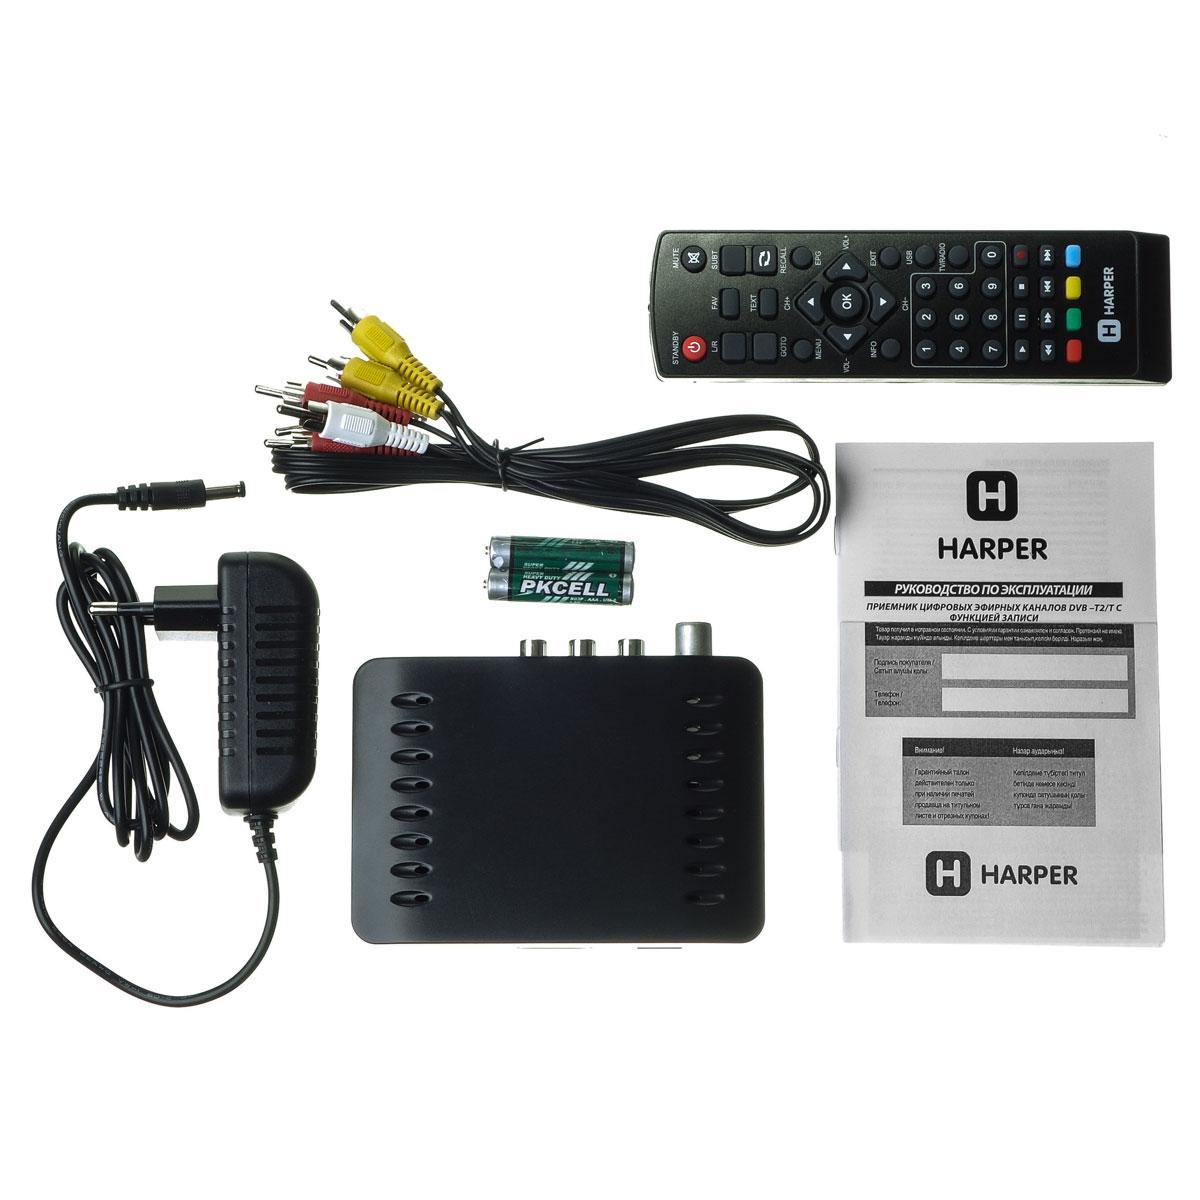 Harper HDT2-1110 телевизионный ресивер DVB-T2